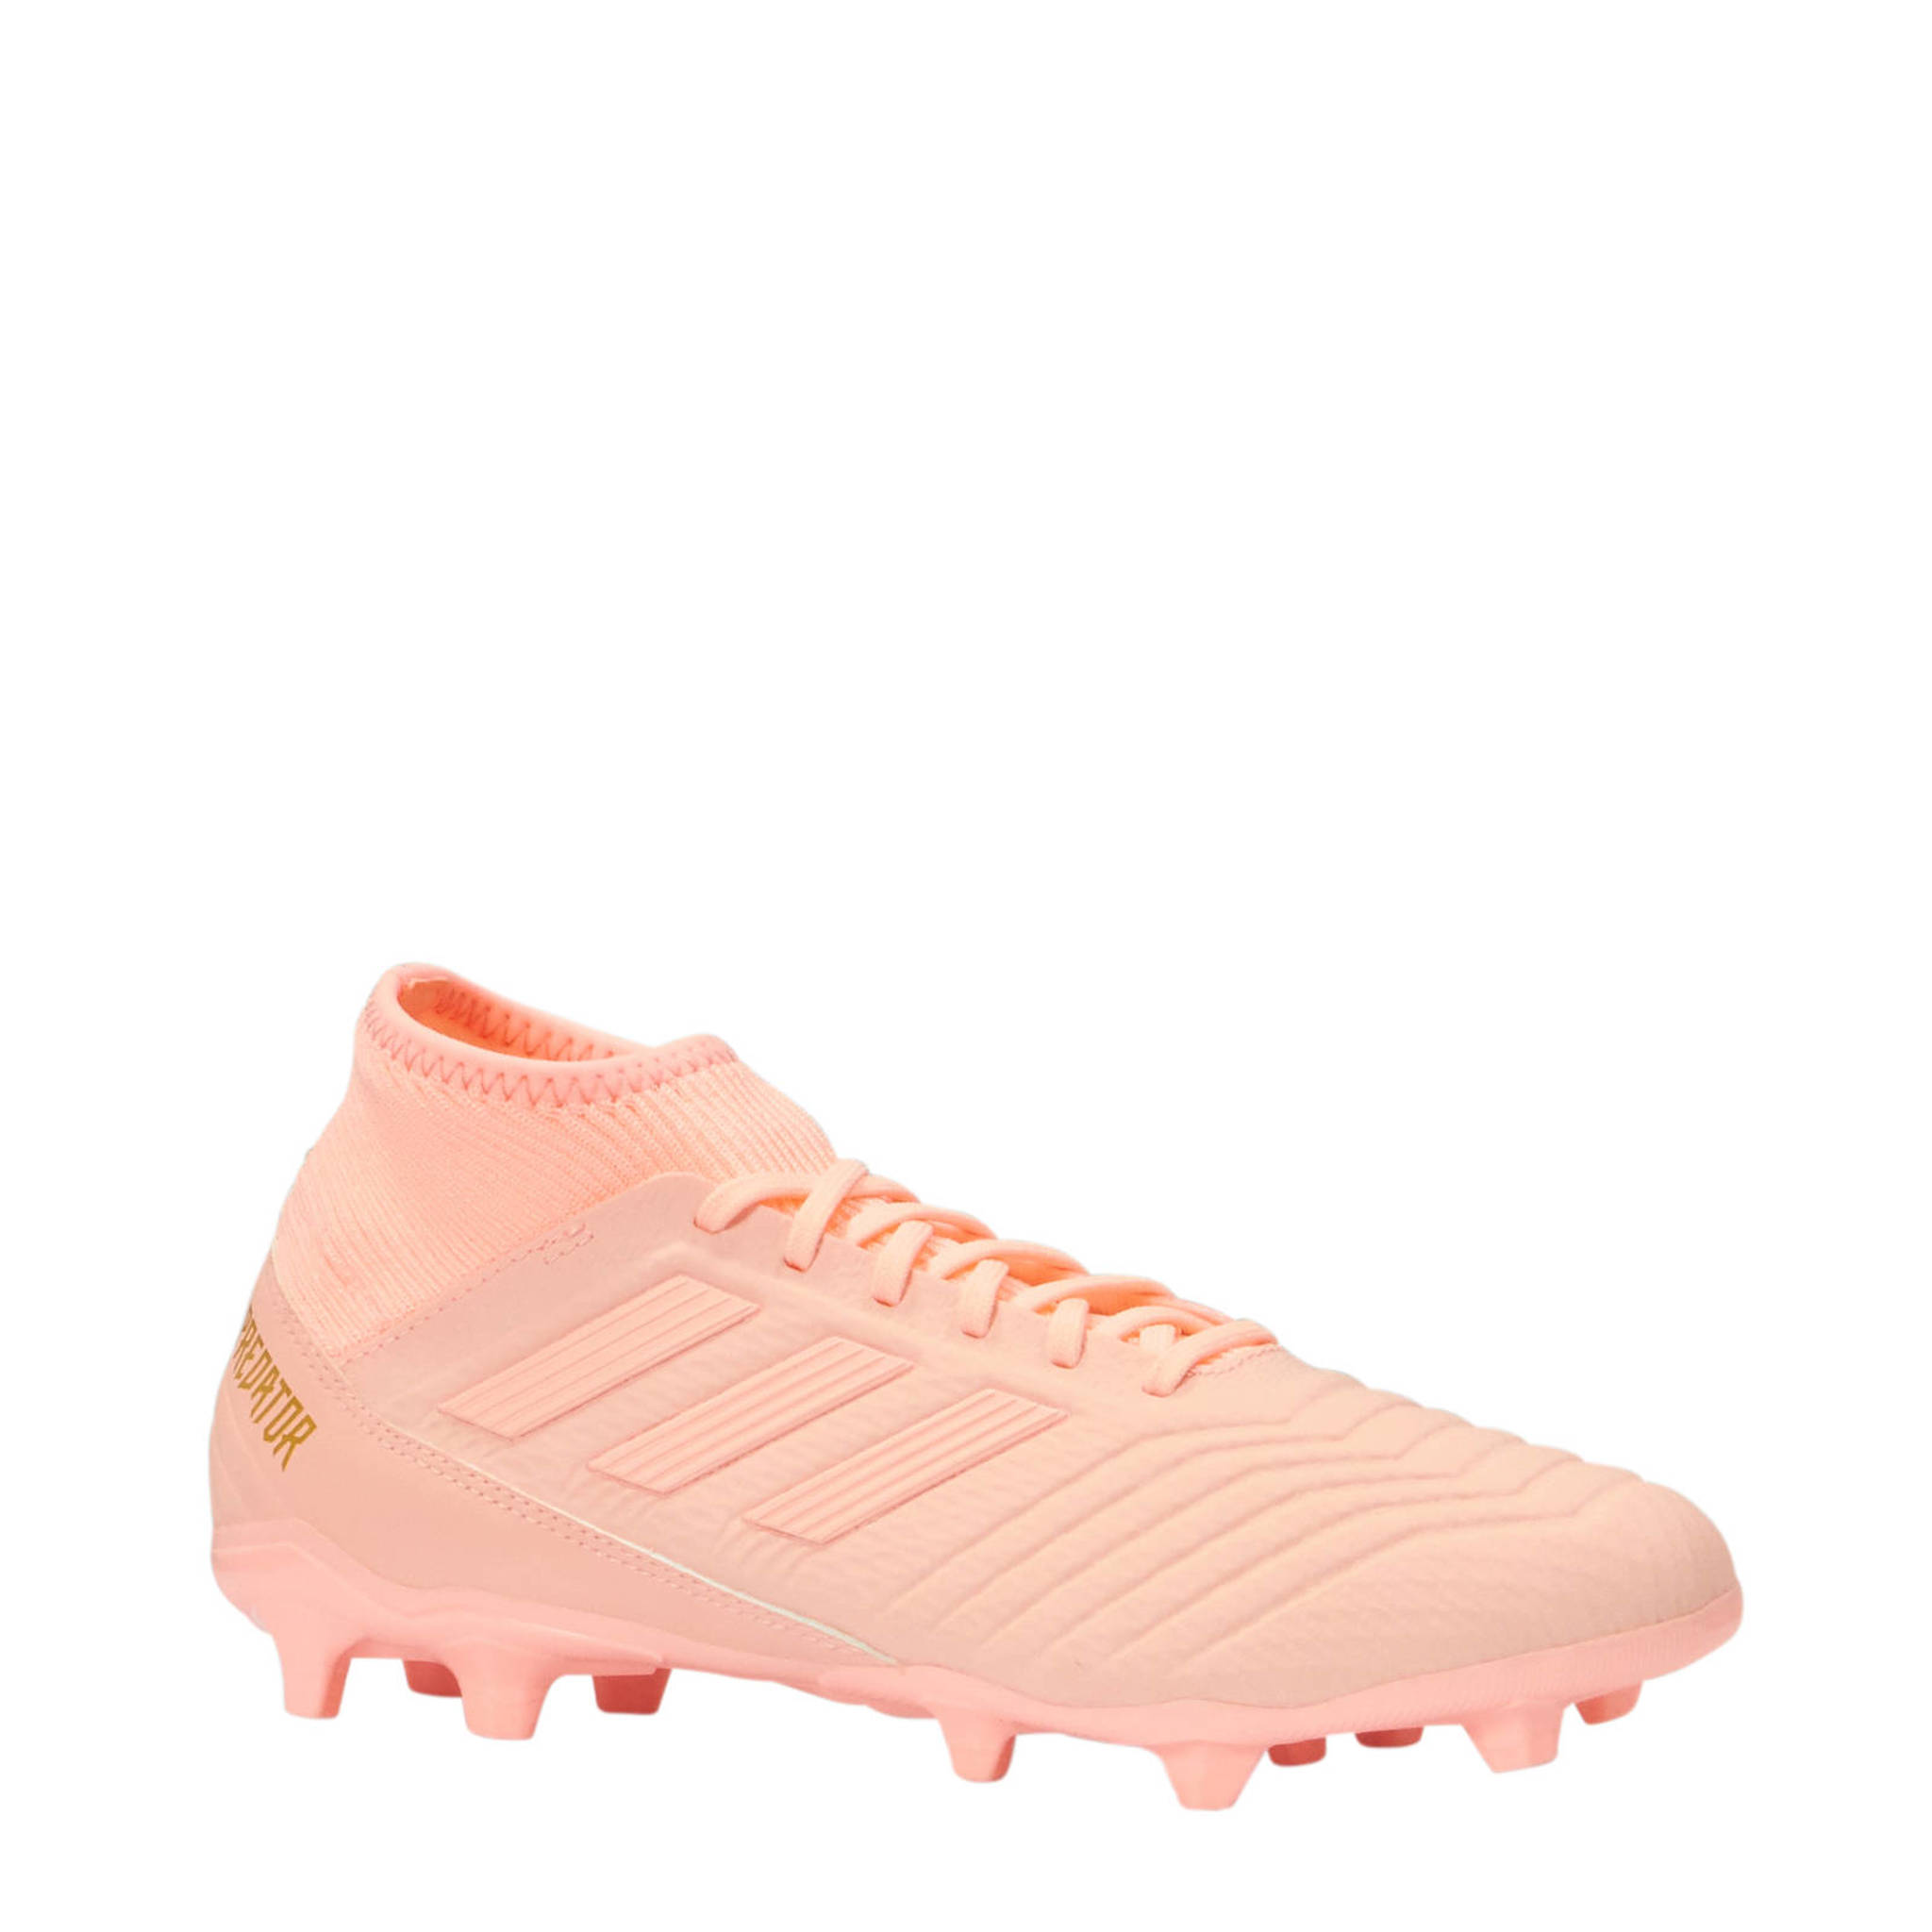 check out 49799 7ef1f adidas performance Predator 18.3 FG voetbalschoenen roze  we